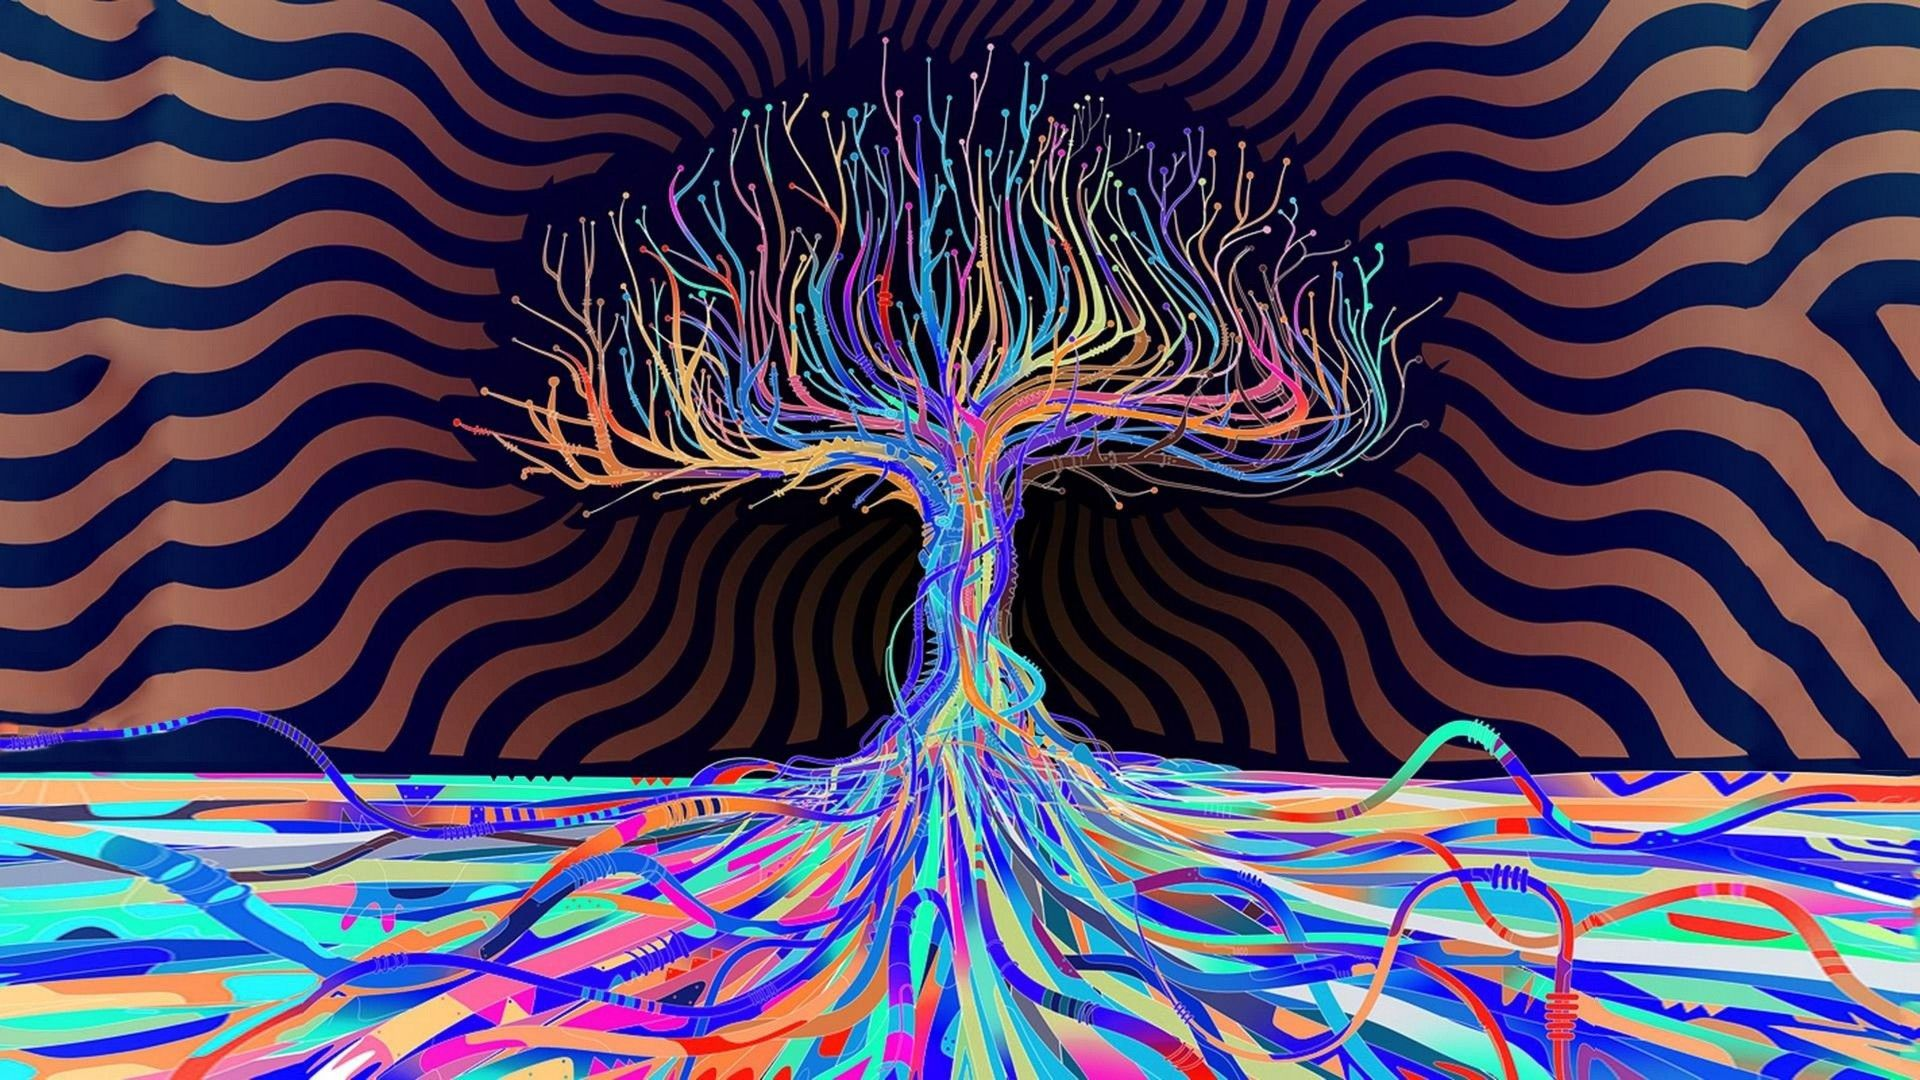 Best Dark Colorful Wallpaper Hd 2021 Live Wallpaper Hd Psychedelic Colors Trippy Wallpaper Psychedelic Art